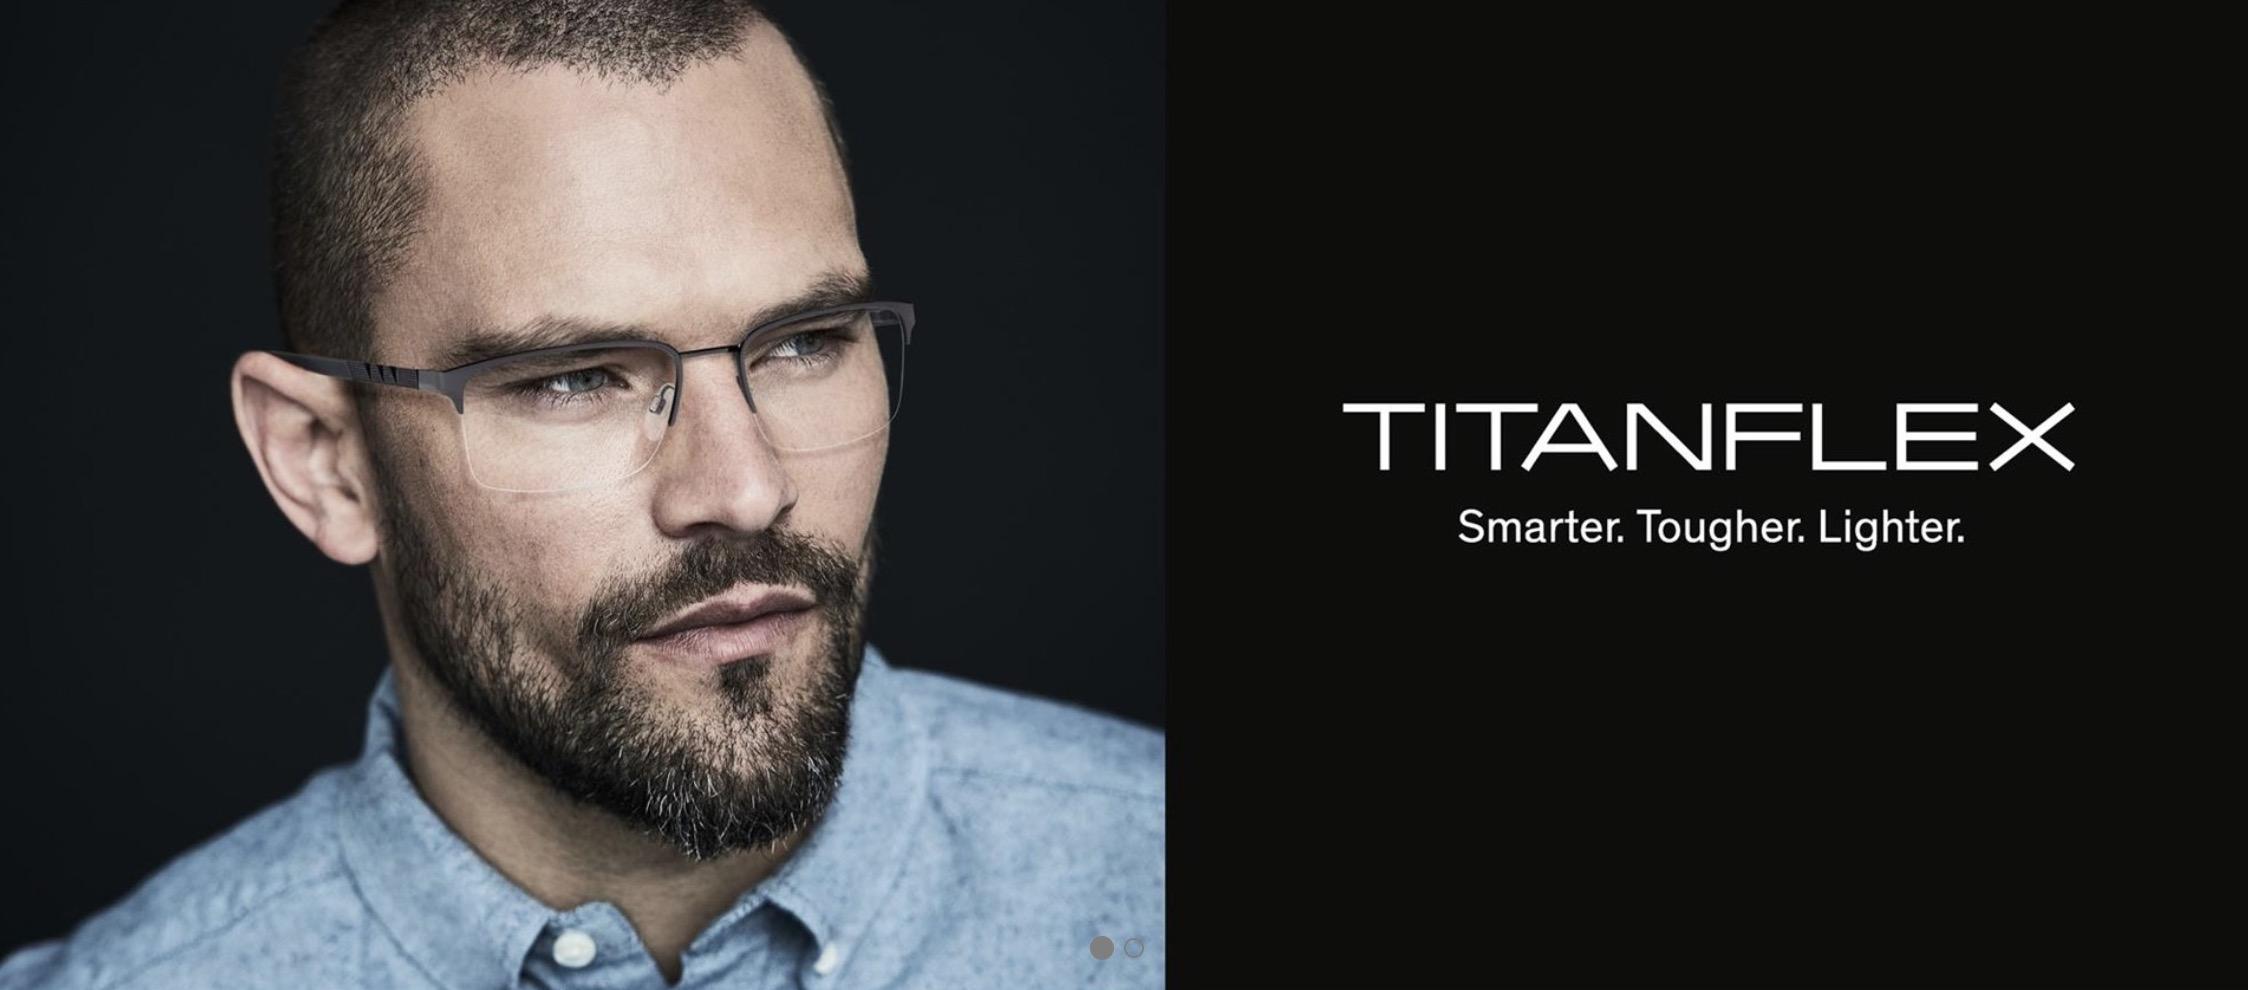 TITANflex Eyewear